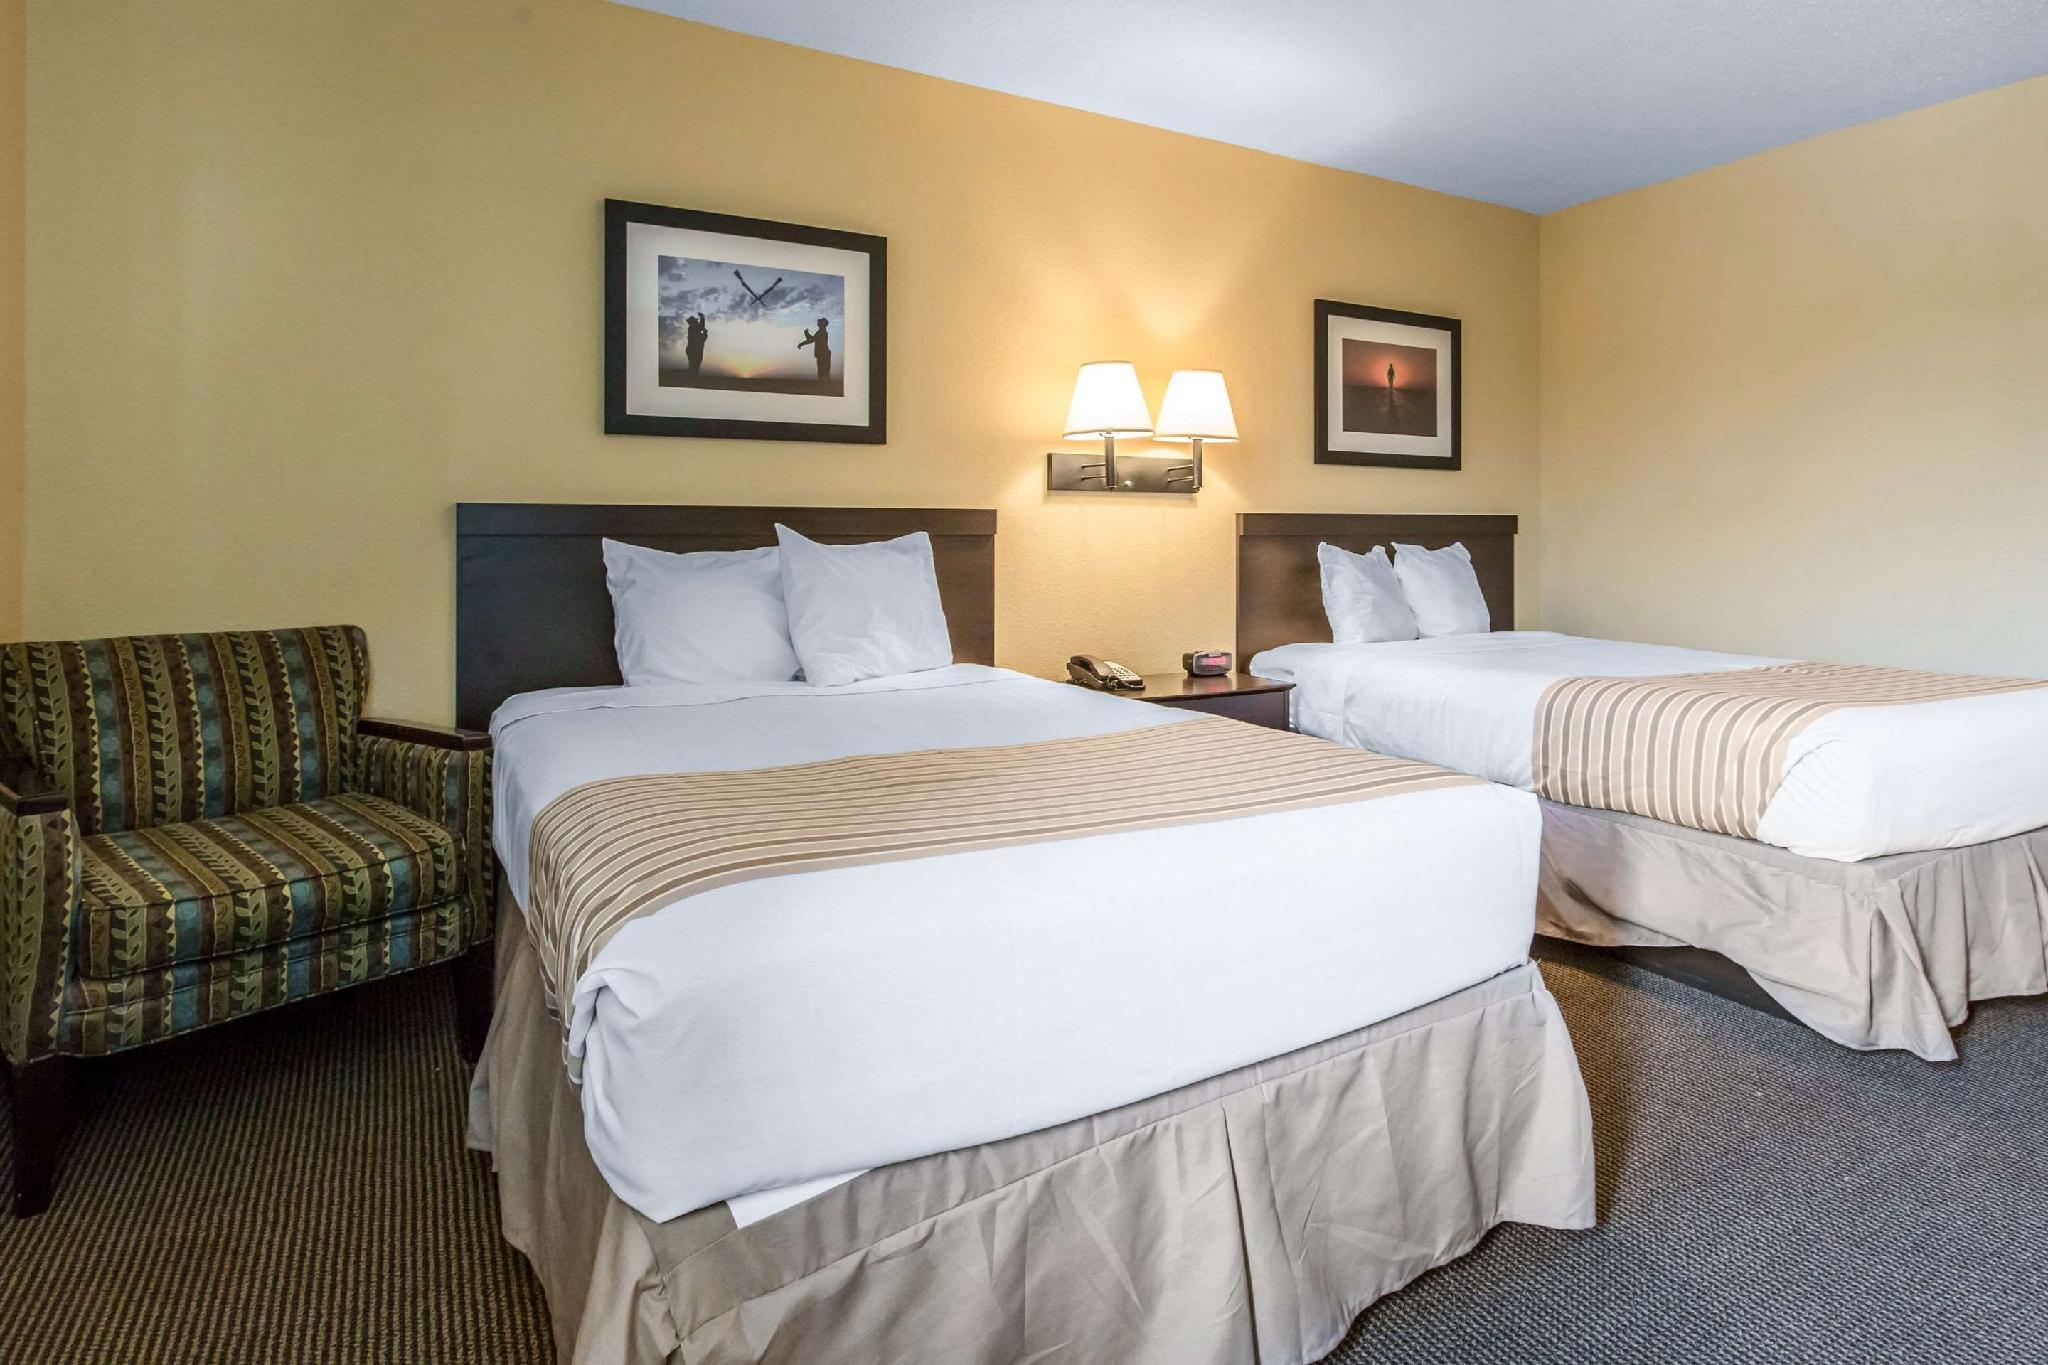 2 Double Beds, Efficiency, Suite, Nonsmoking